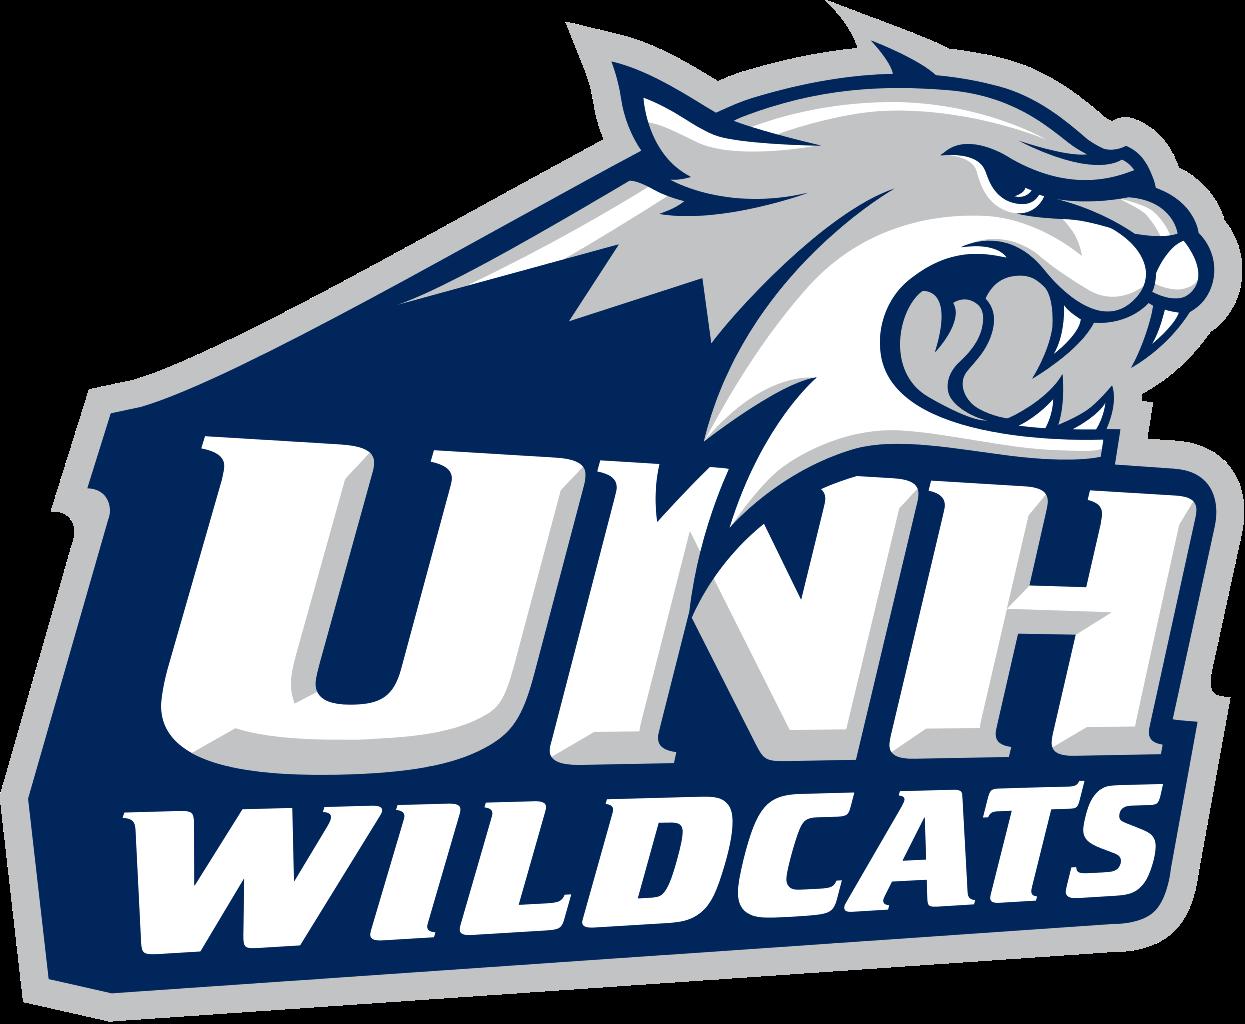 University of New Hampshire Wildcats, NCAA Division I